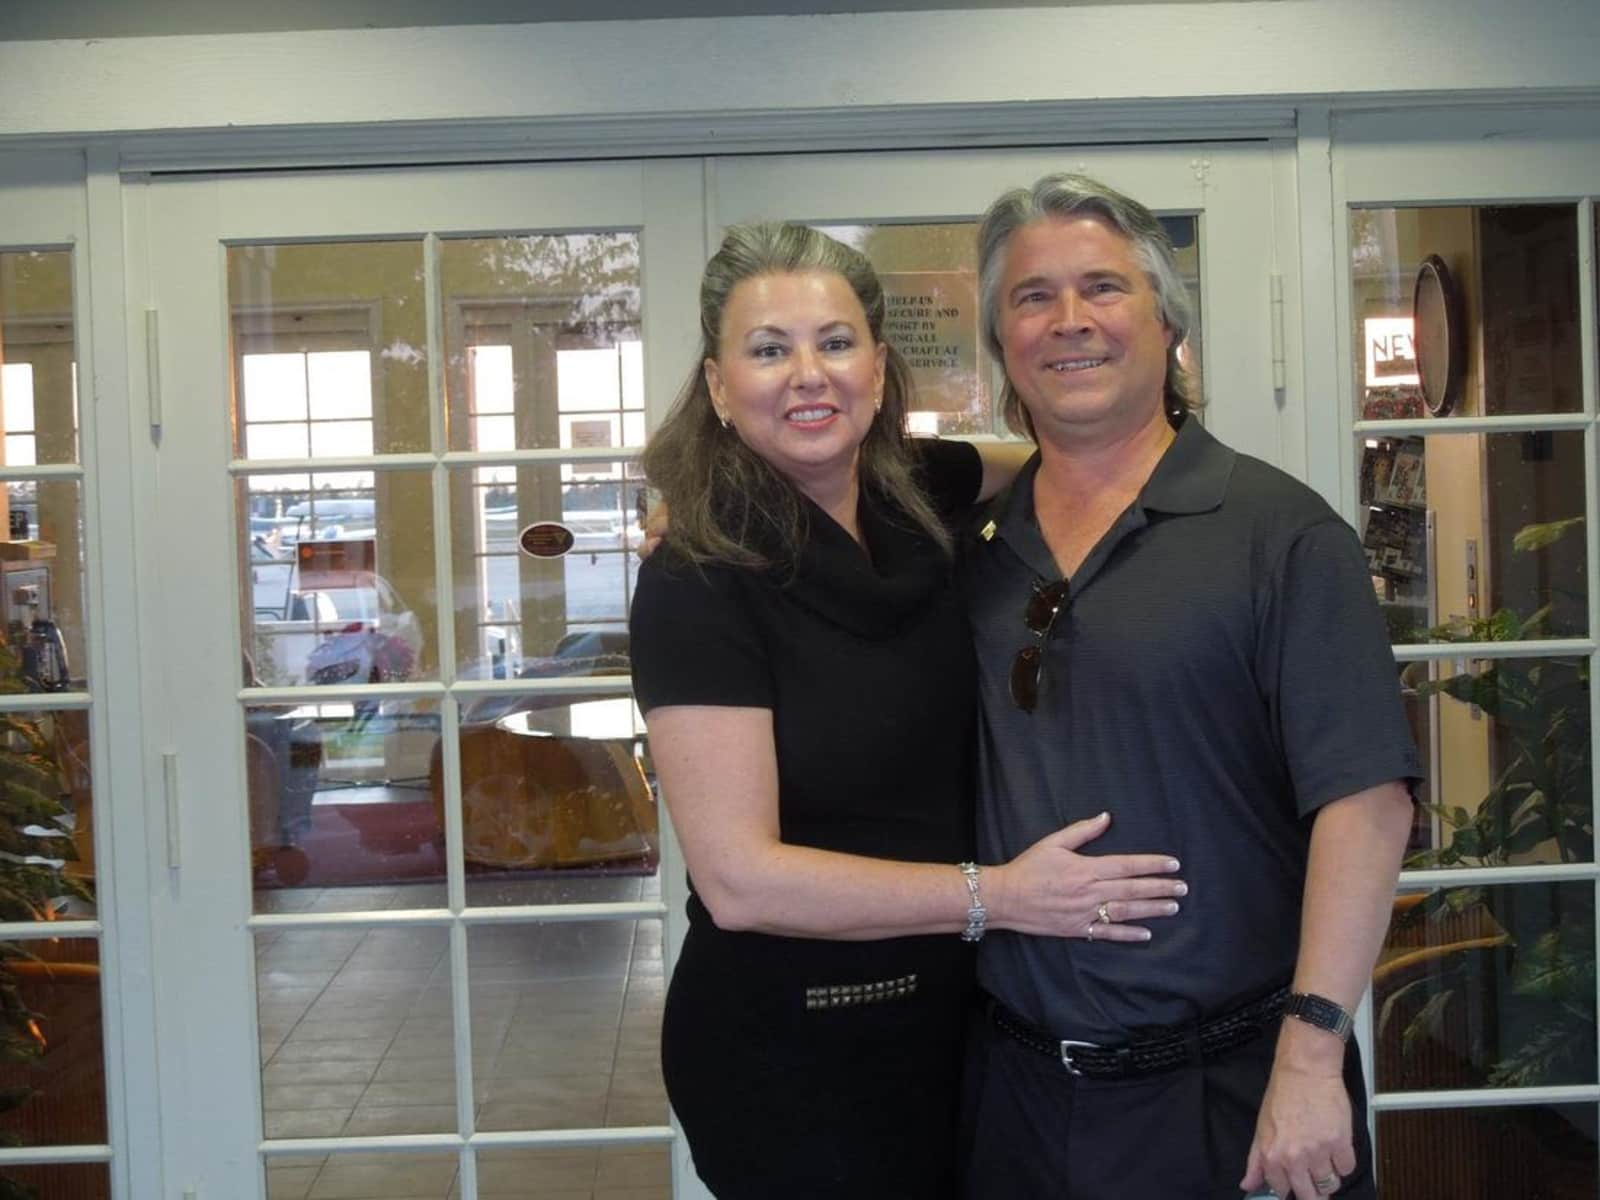 Alan & Marilynne from Dayton, Ohio, United States